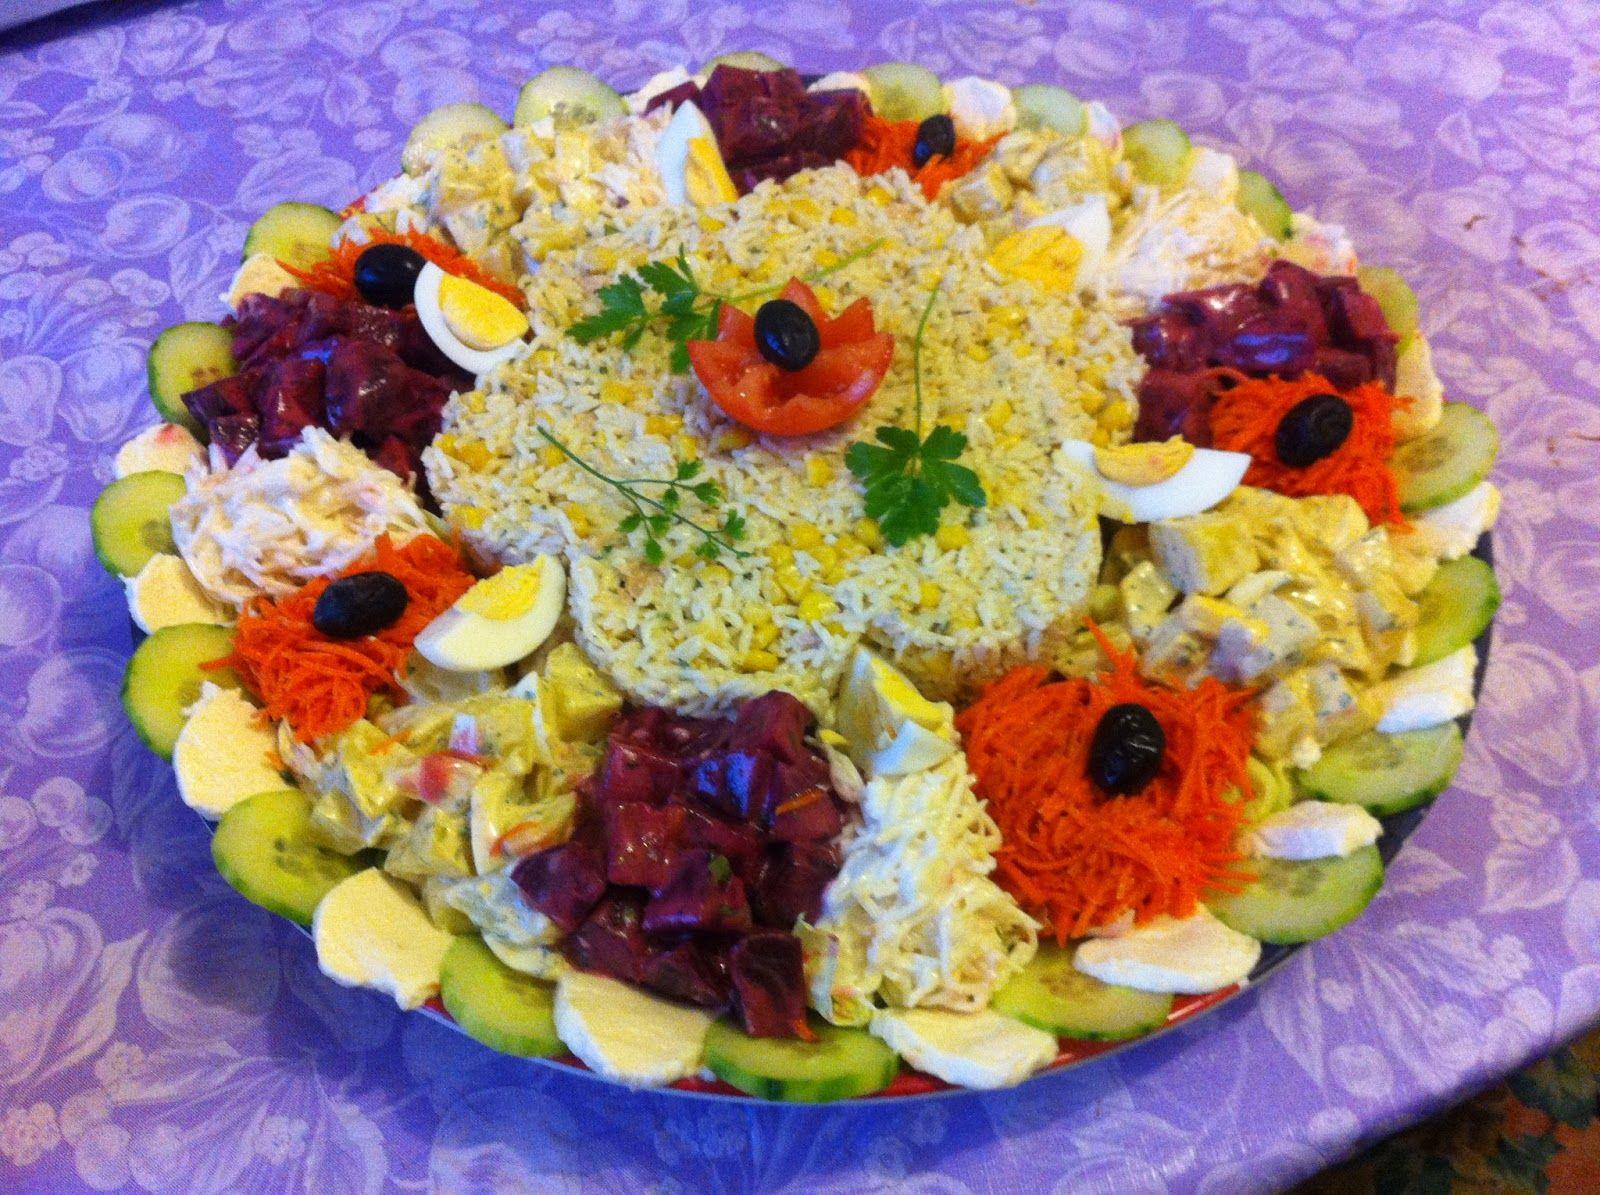 Salade compos e pour grande tabl e entr e salade pinterest salade salades compos es et - Une royale en cuisine ...